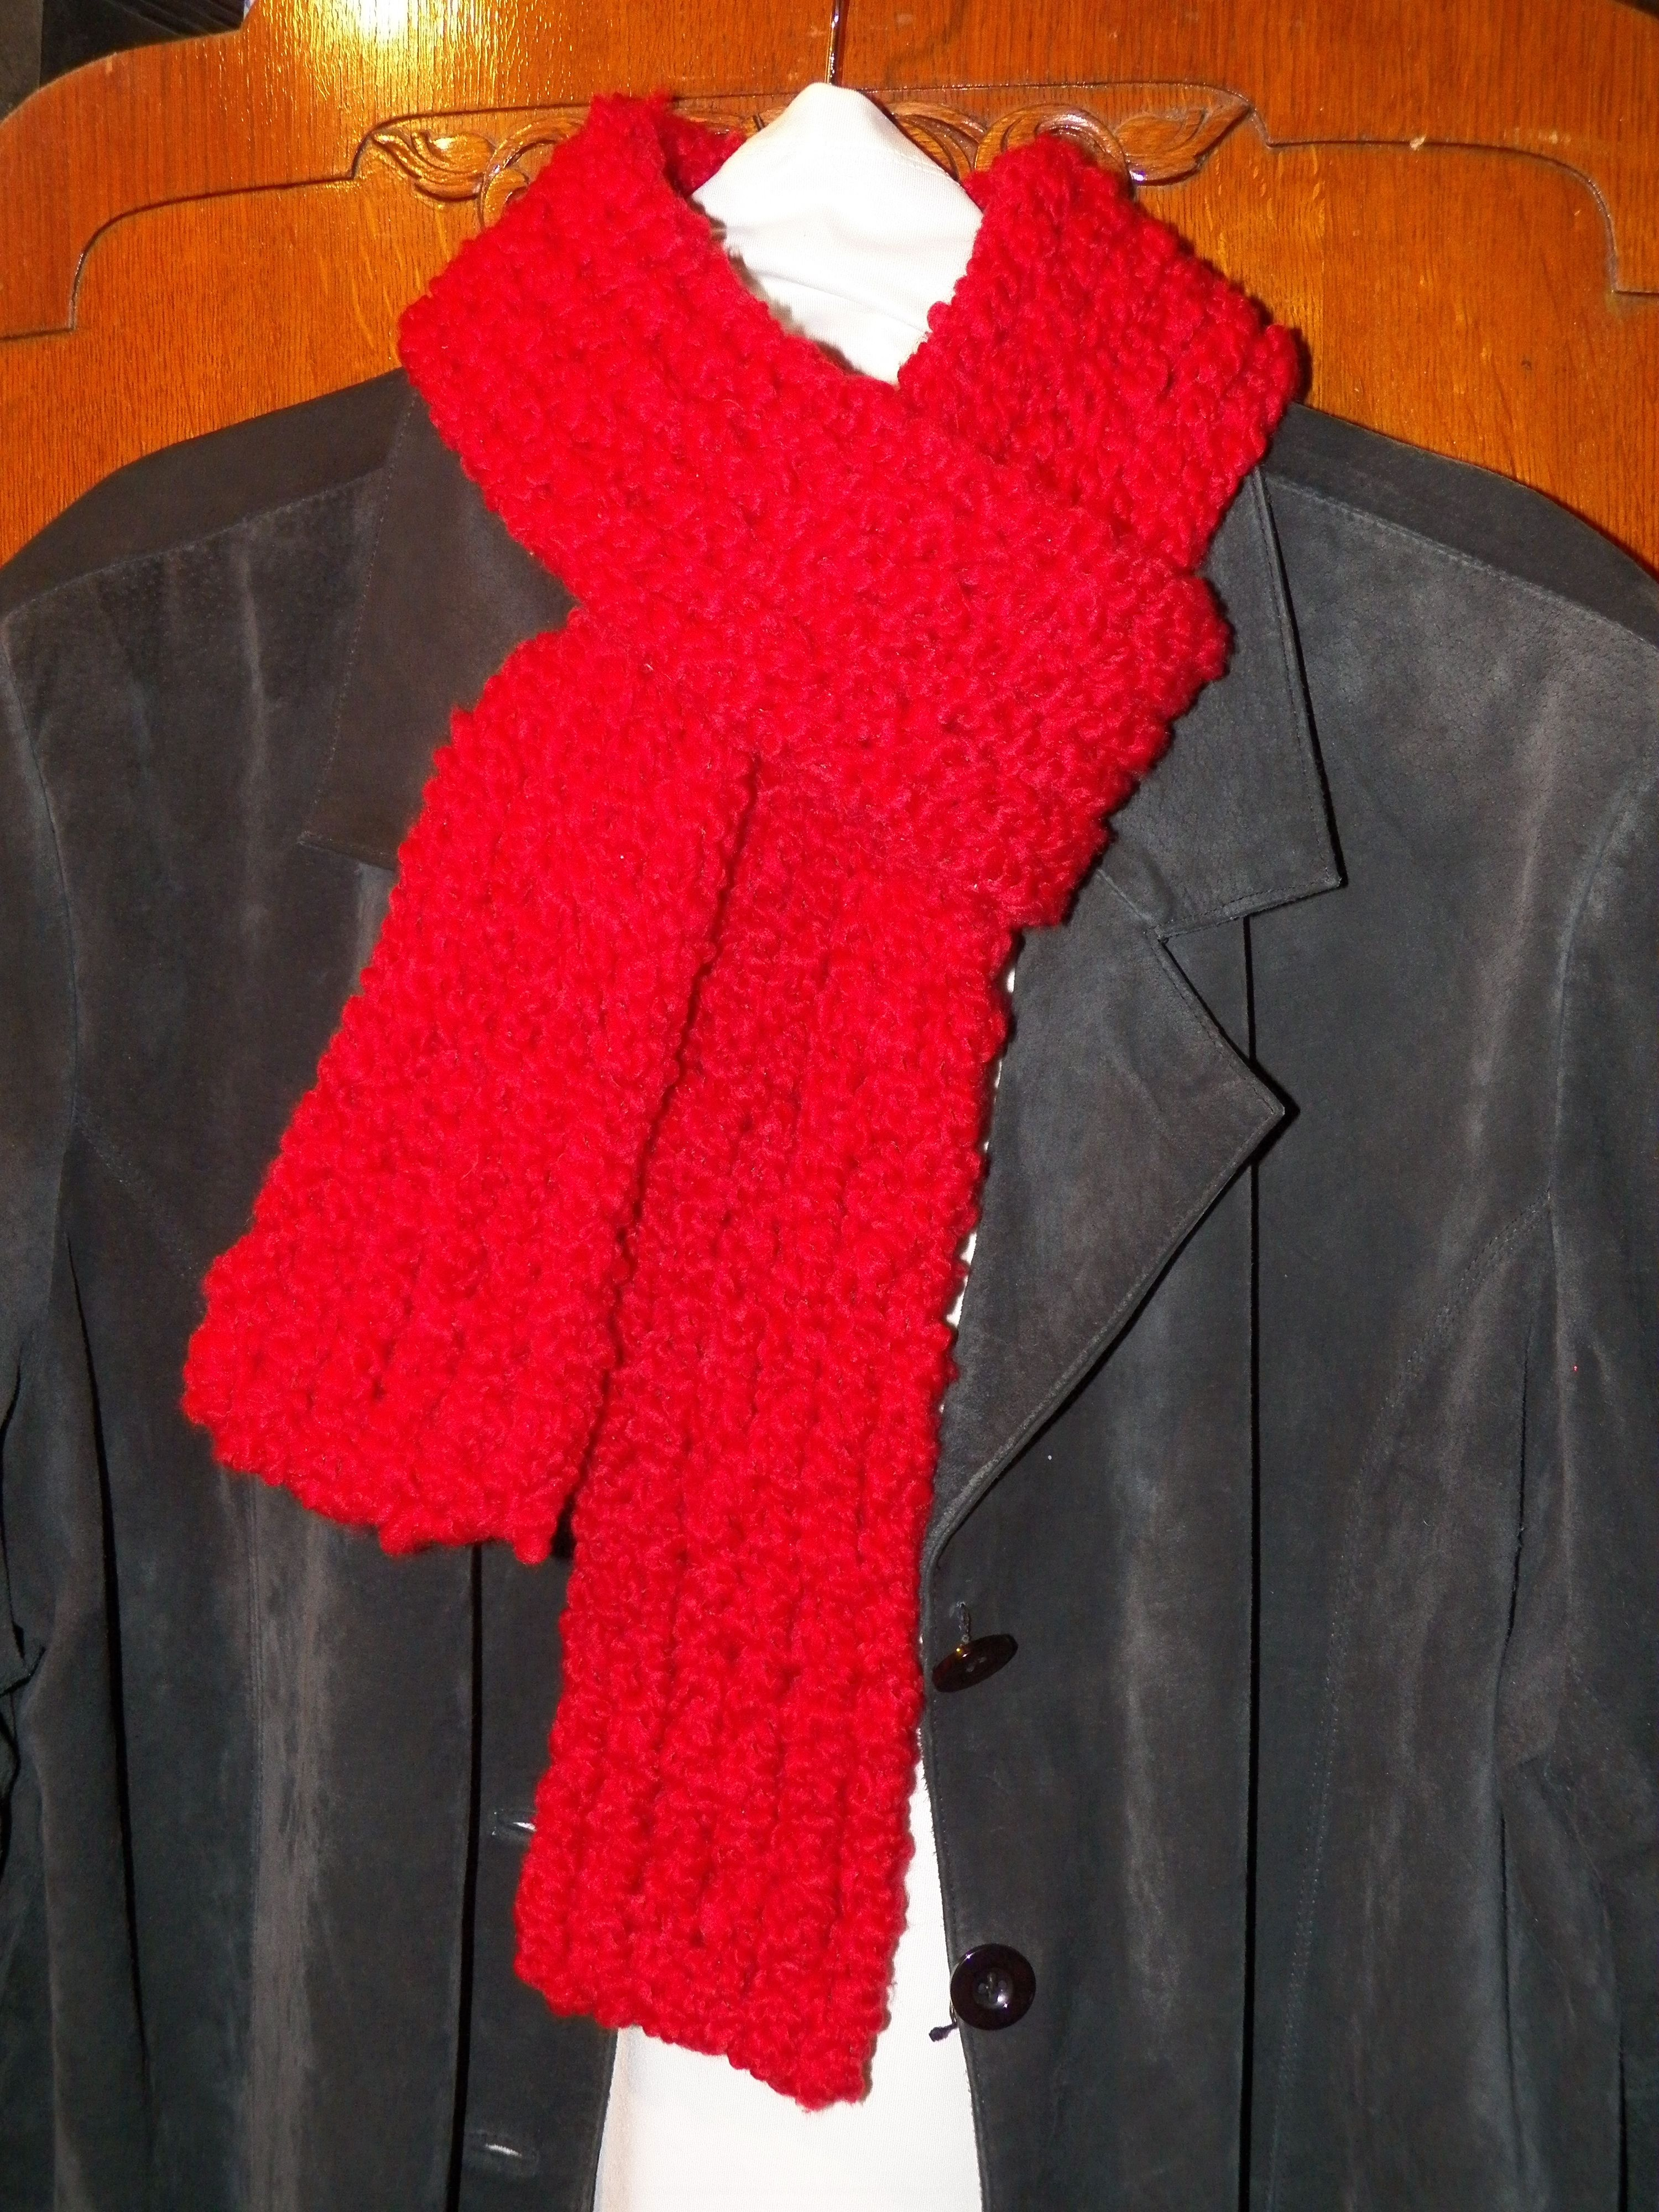 Bulky Red Scarf Used Yarn Bee Fleece Lite Yarn